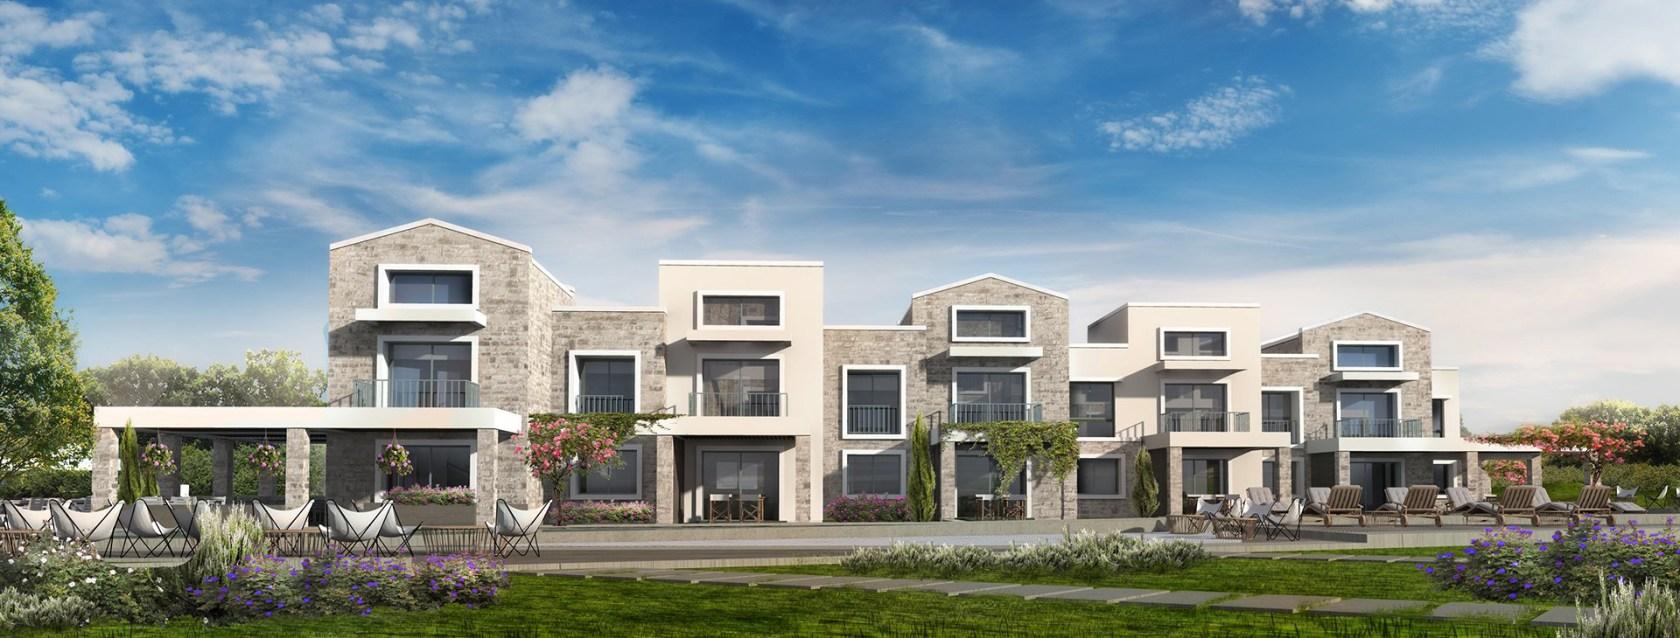 Thalassa Suites, Corfu, Greece - Architizer